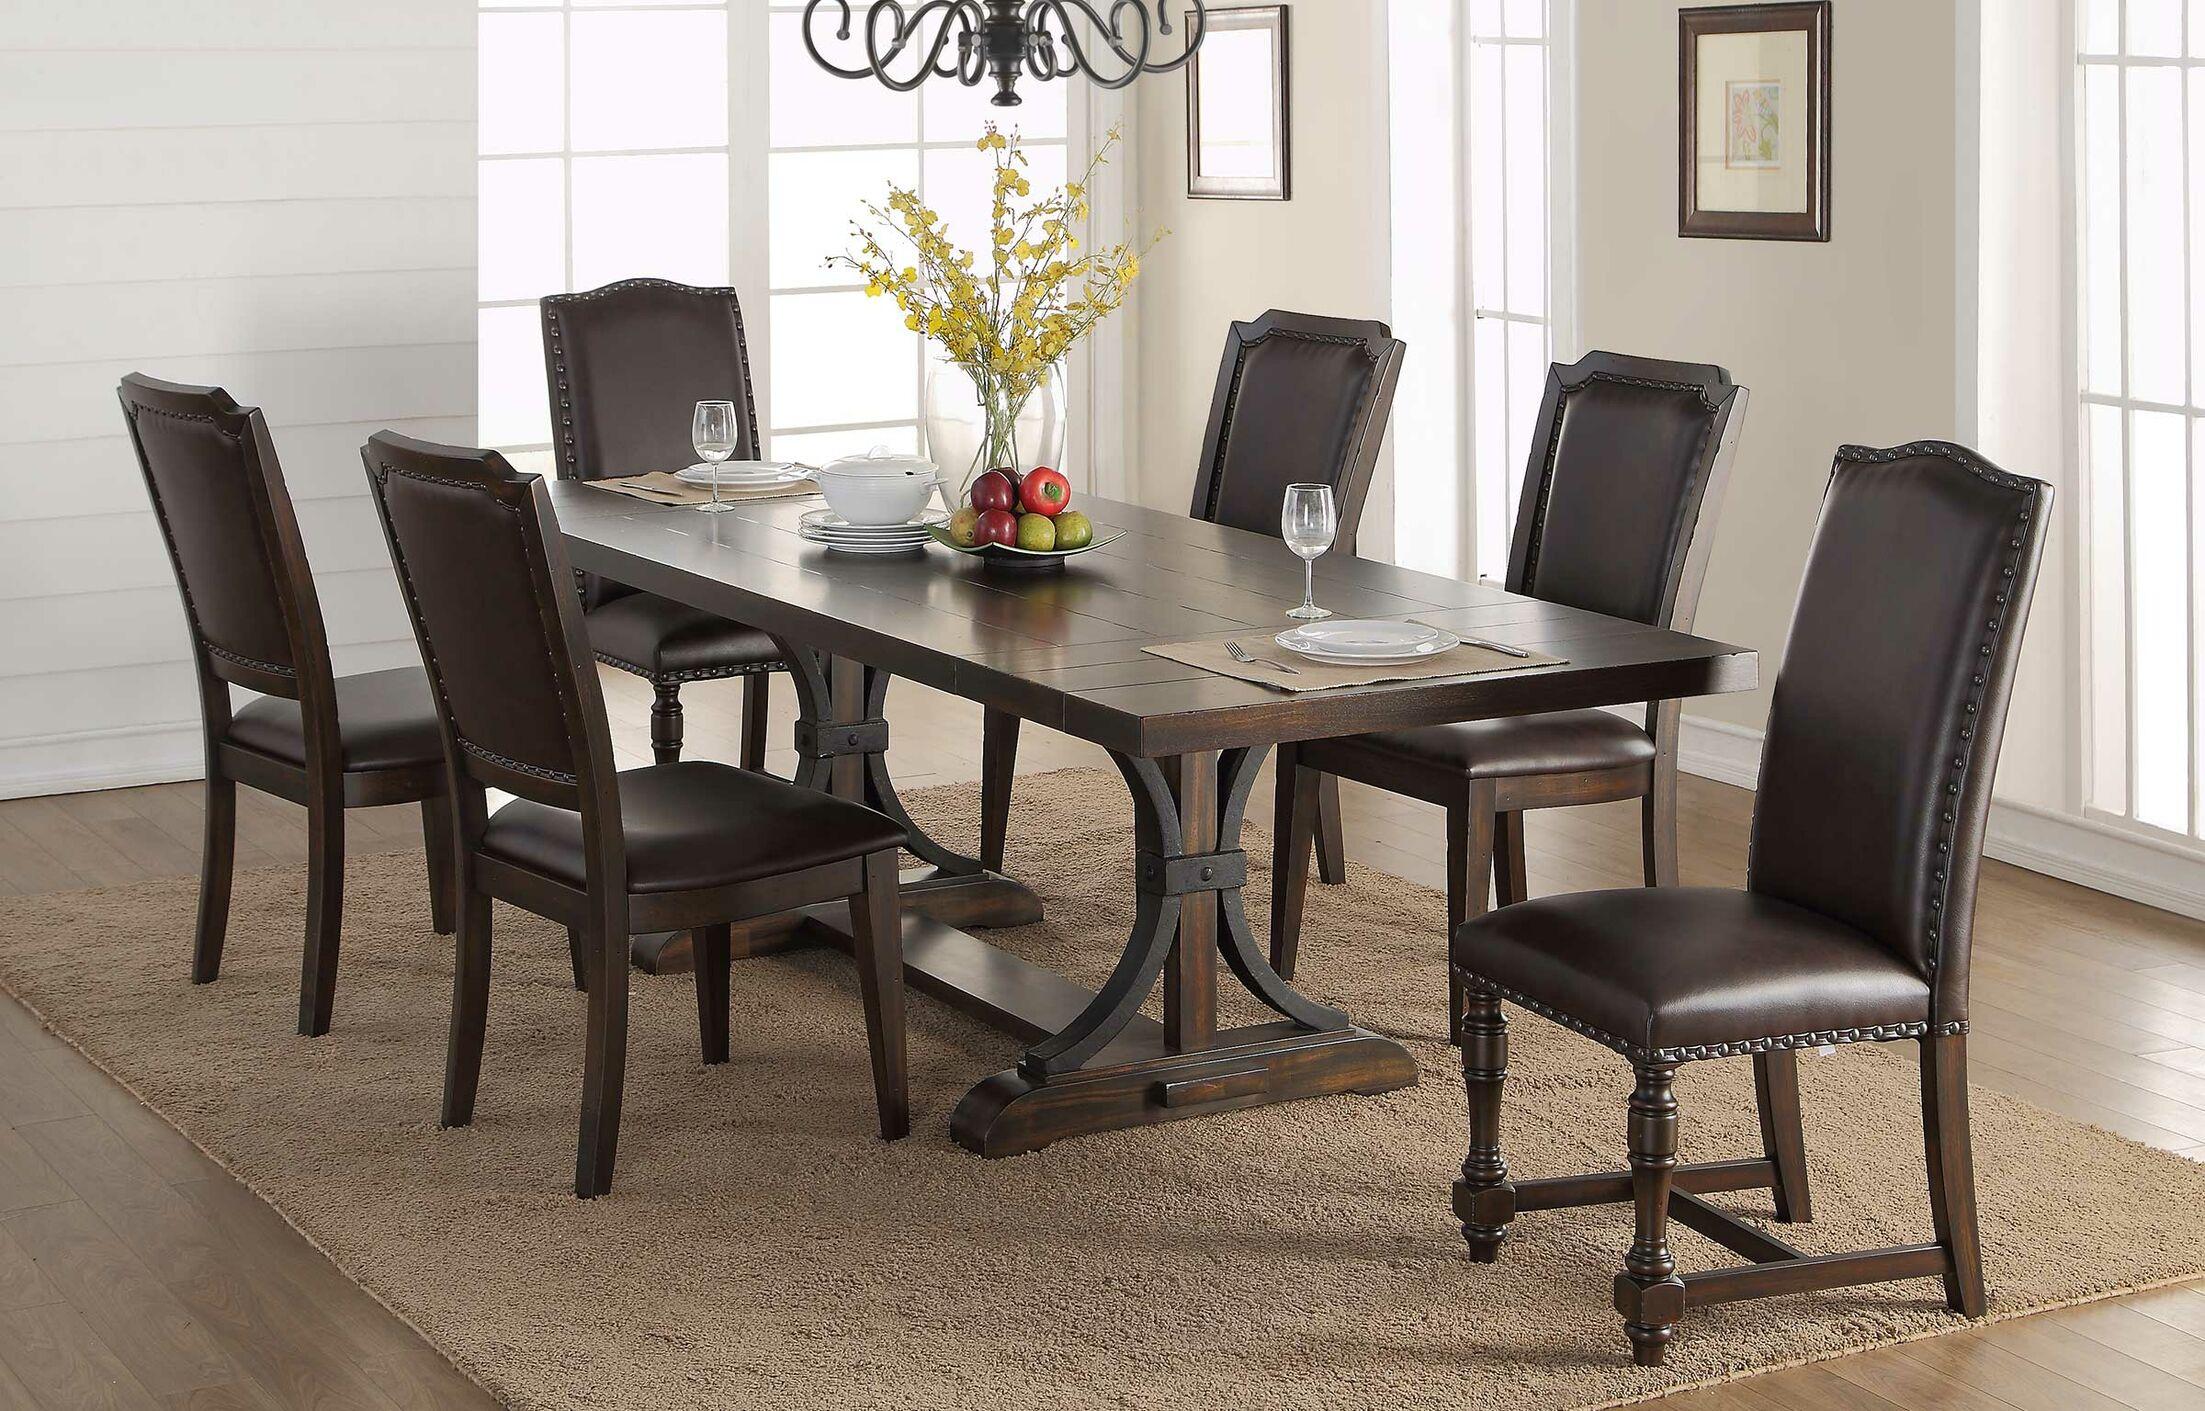 Keshia Upholstered Dining Chair (Set of 2)